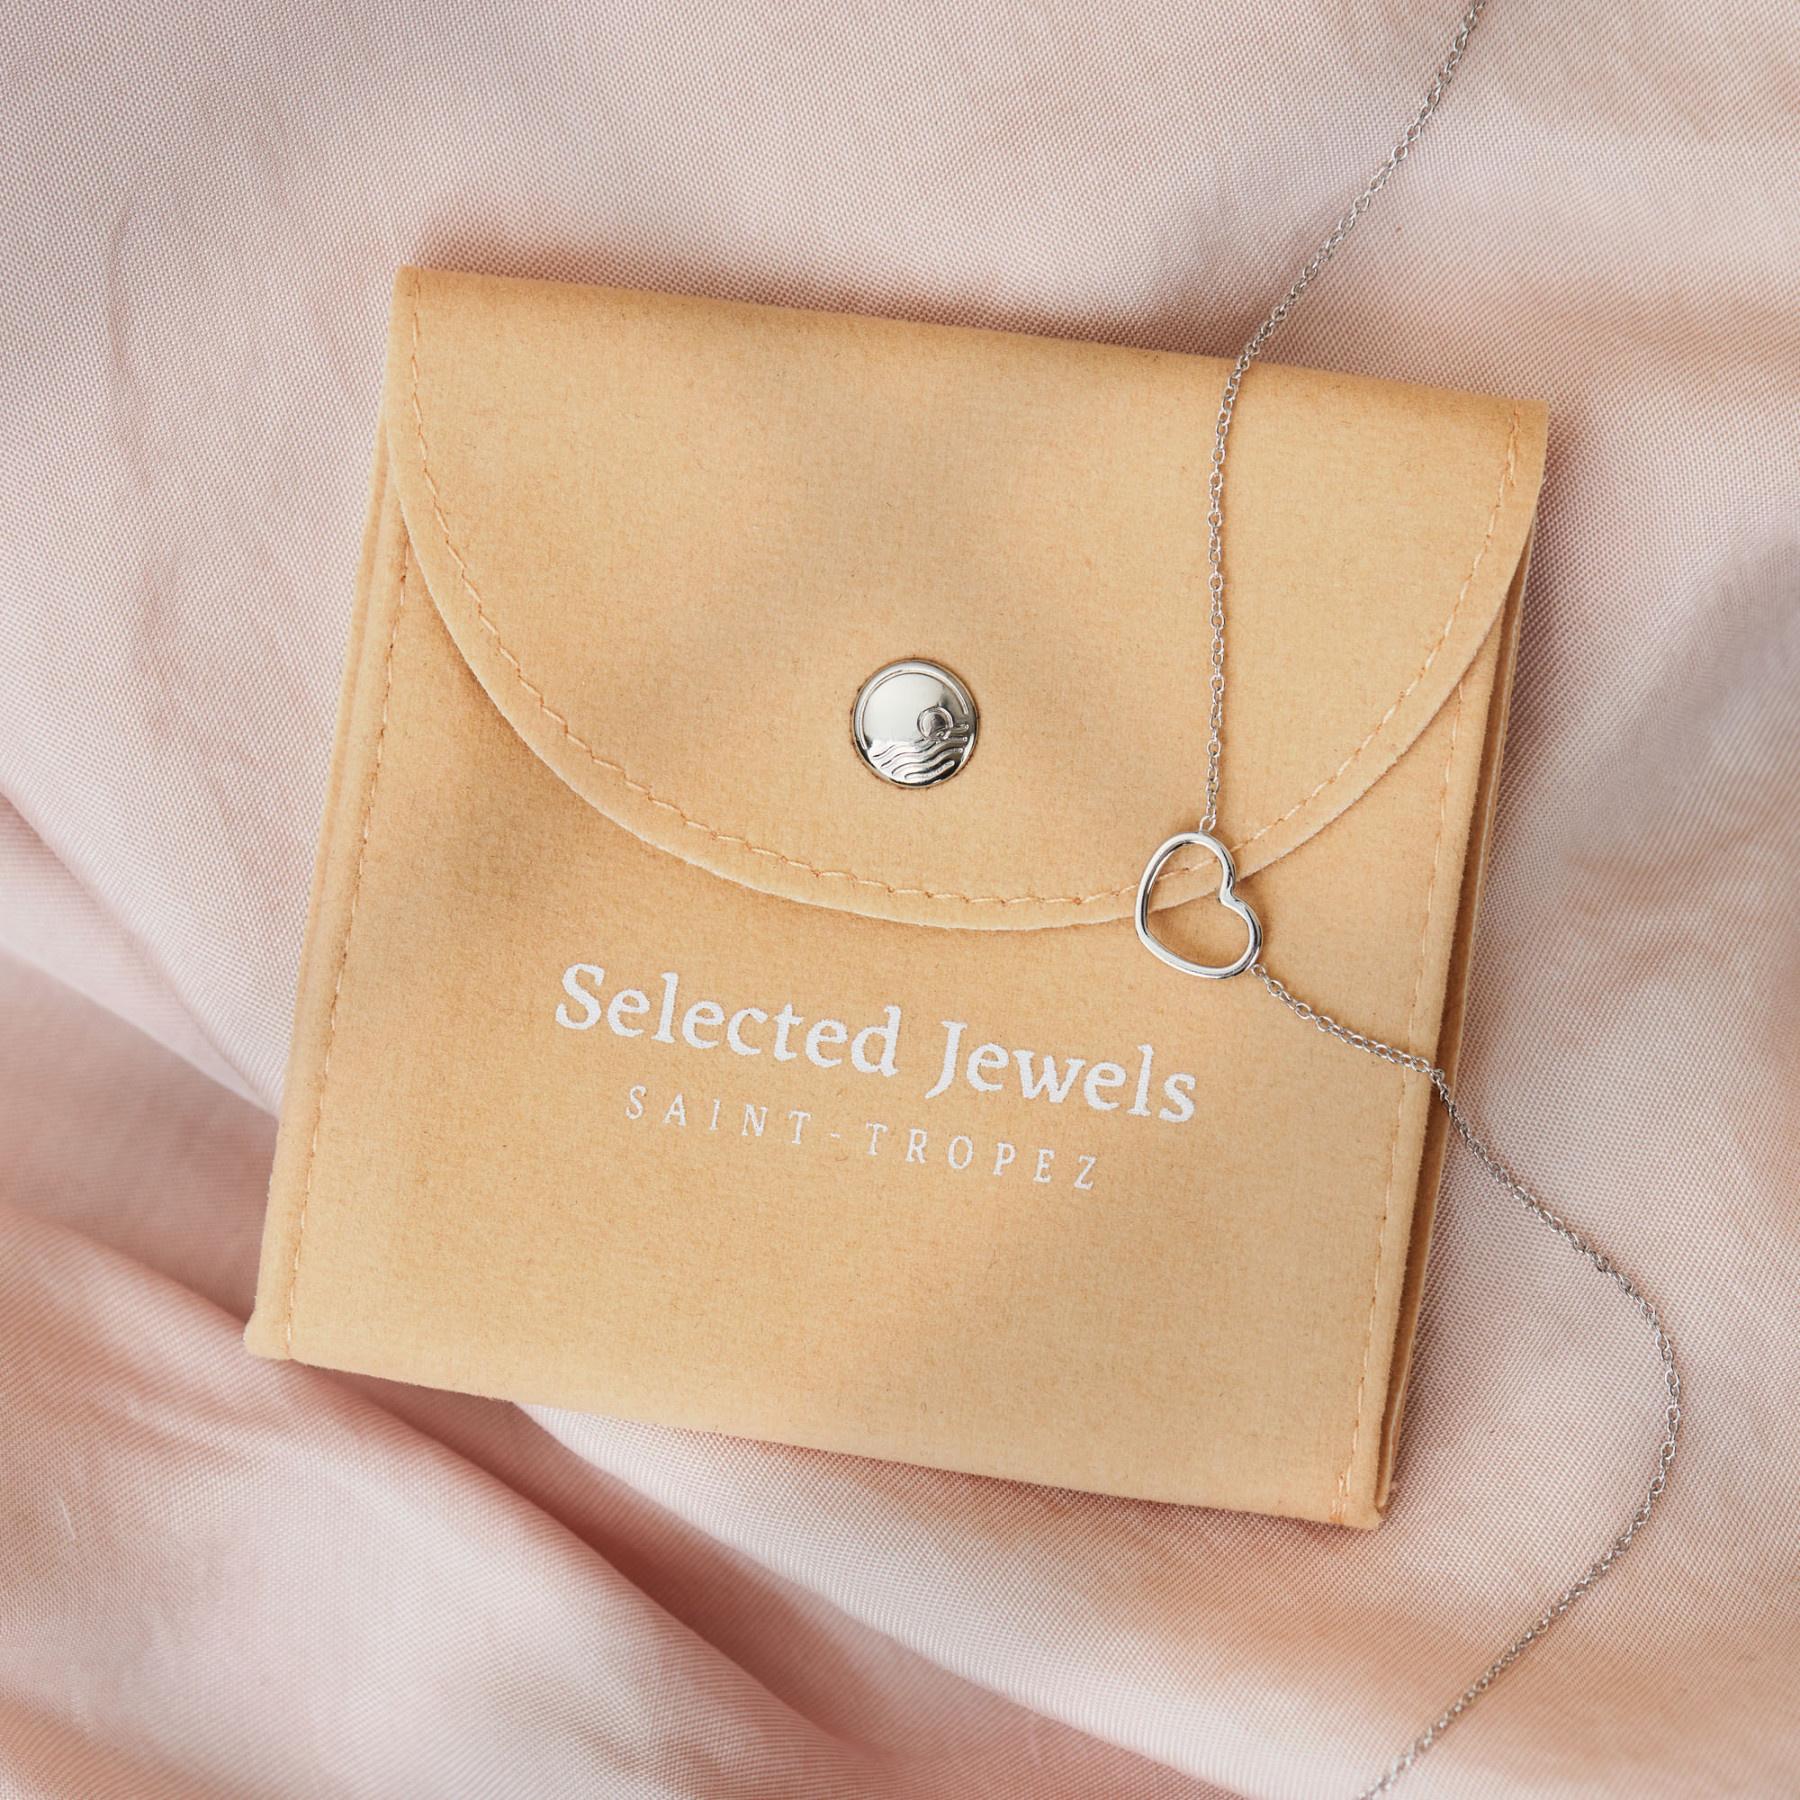 Selected Jewels Julie Théa 925 Sterling Silber Creolen